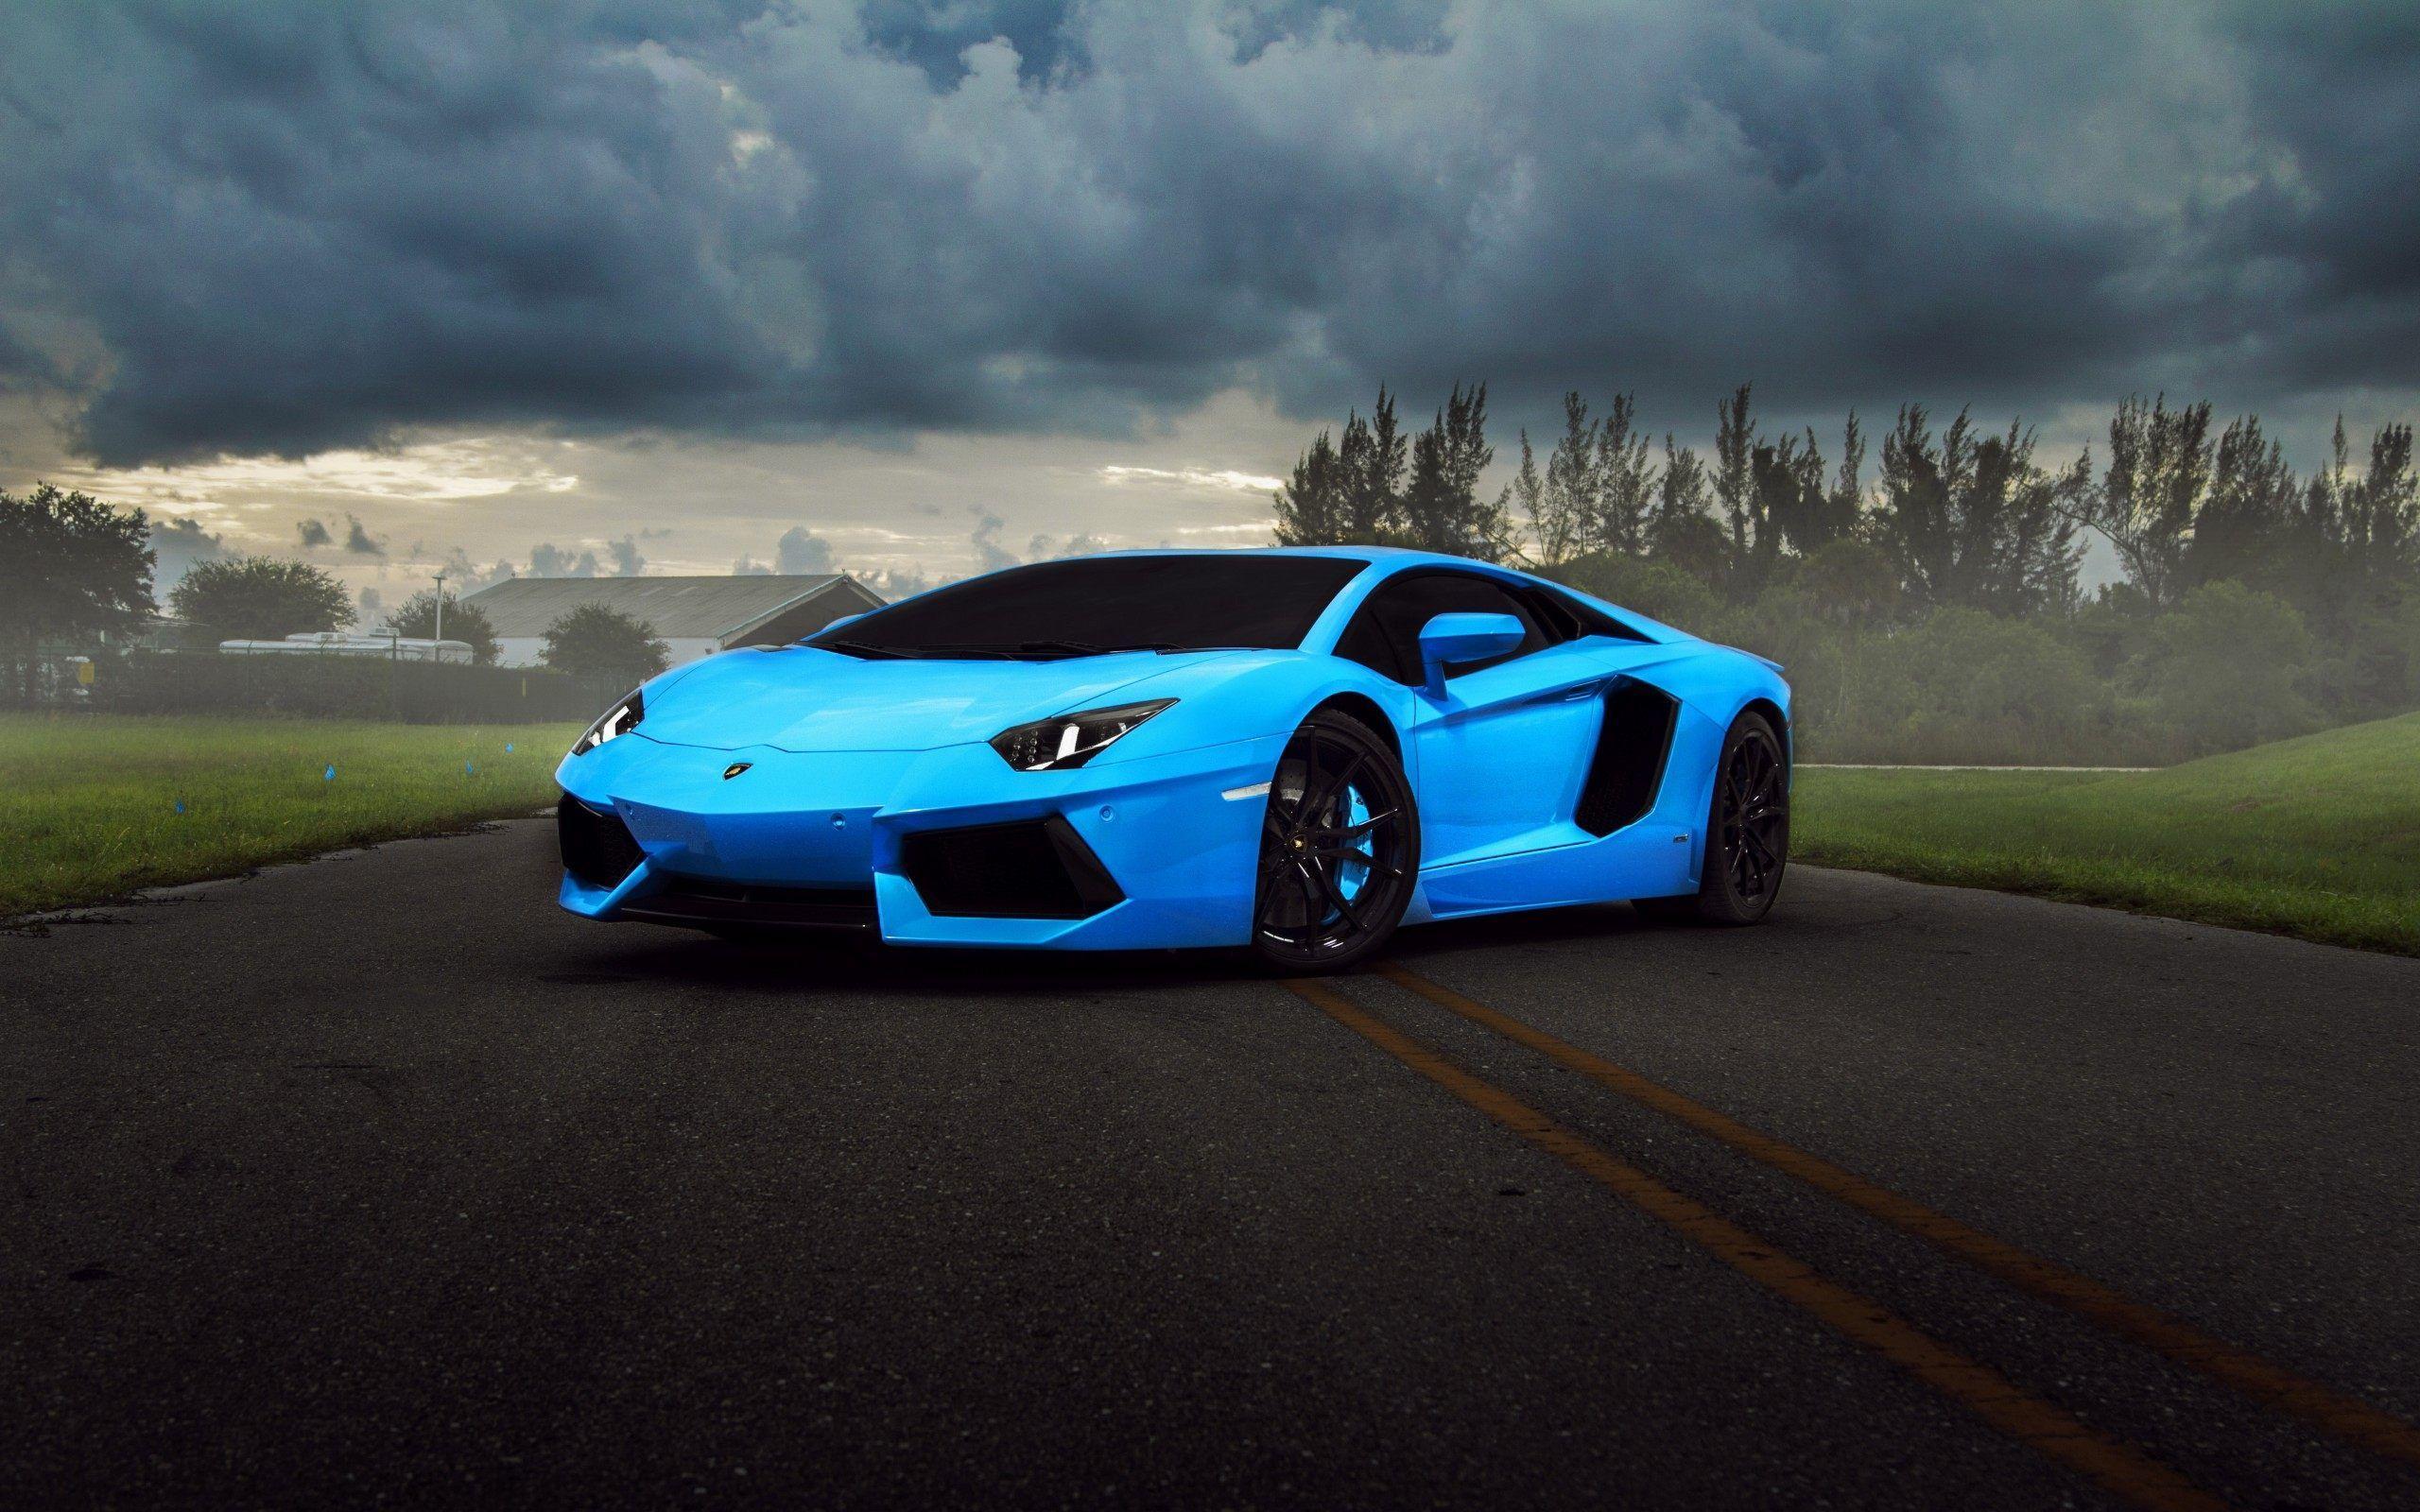 Super Car Wallpapers Top Free Super Car Backgrounds Wallpaperaccess